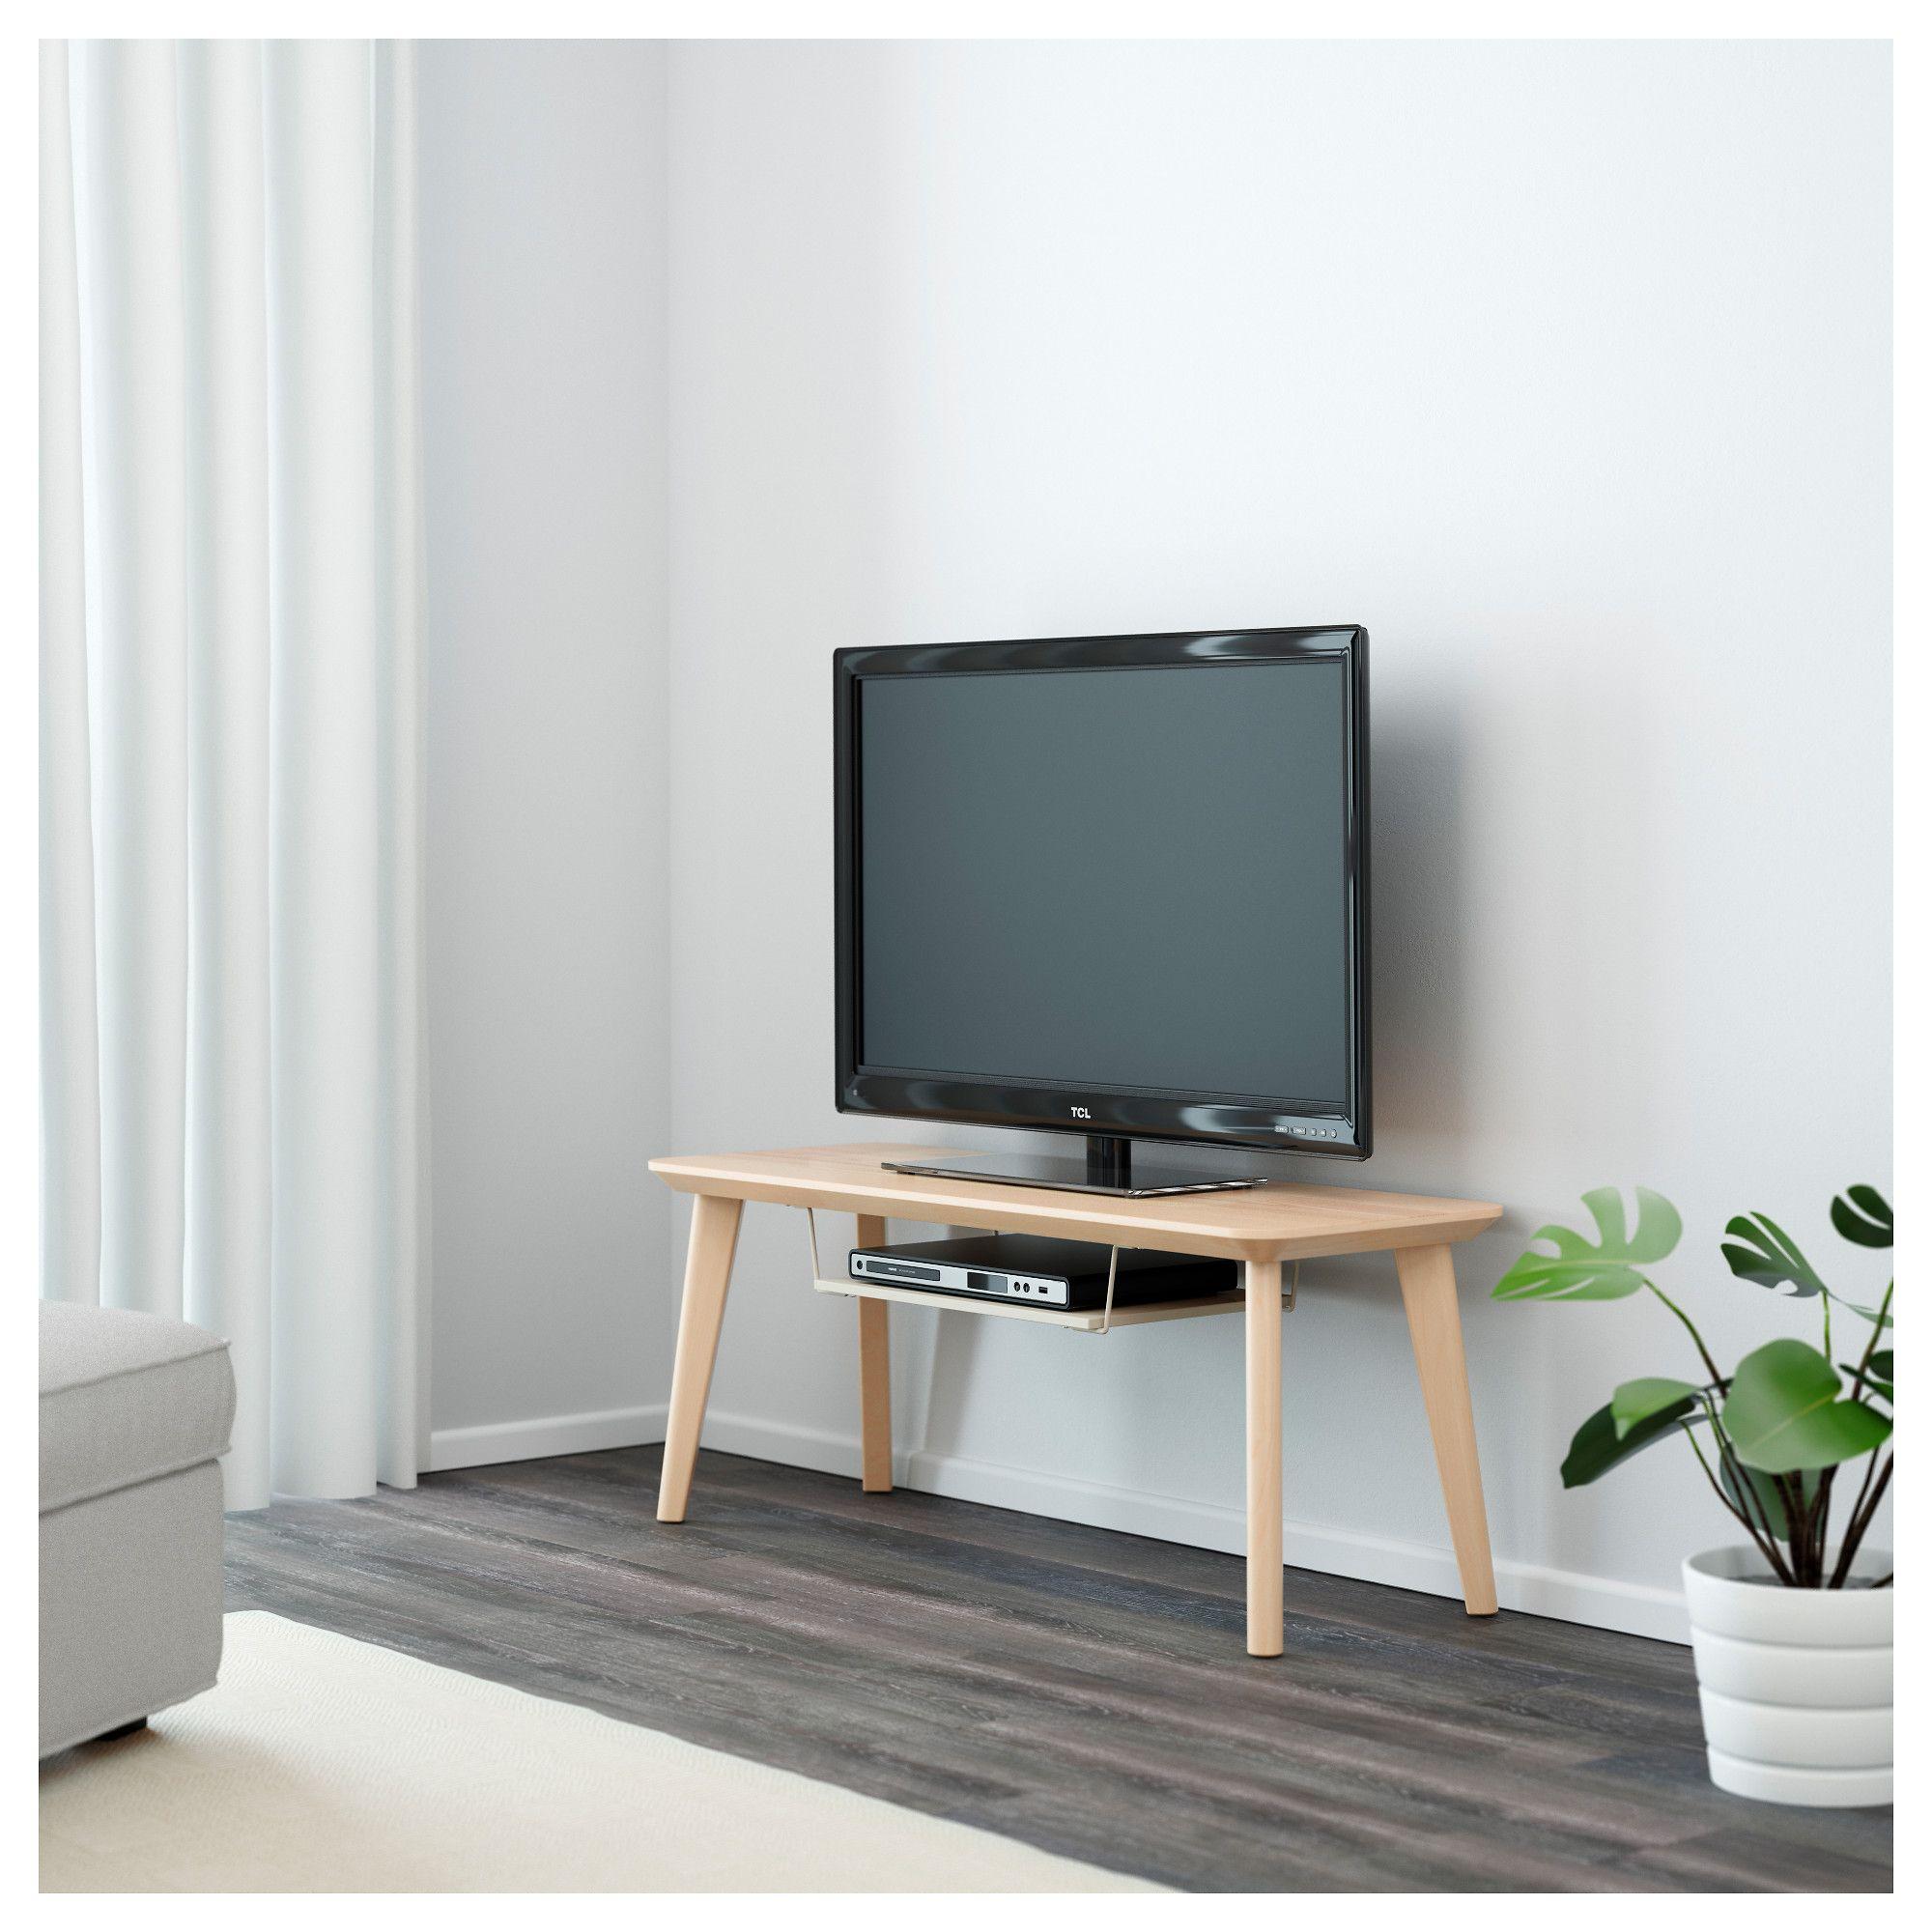 Tv Dvd Meubel.Us Furniture And Home Furnishings Tv Bench Furniture Tv Unit